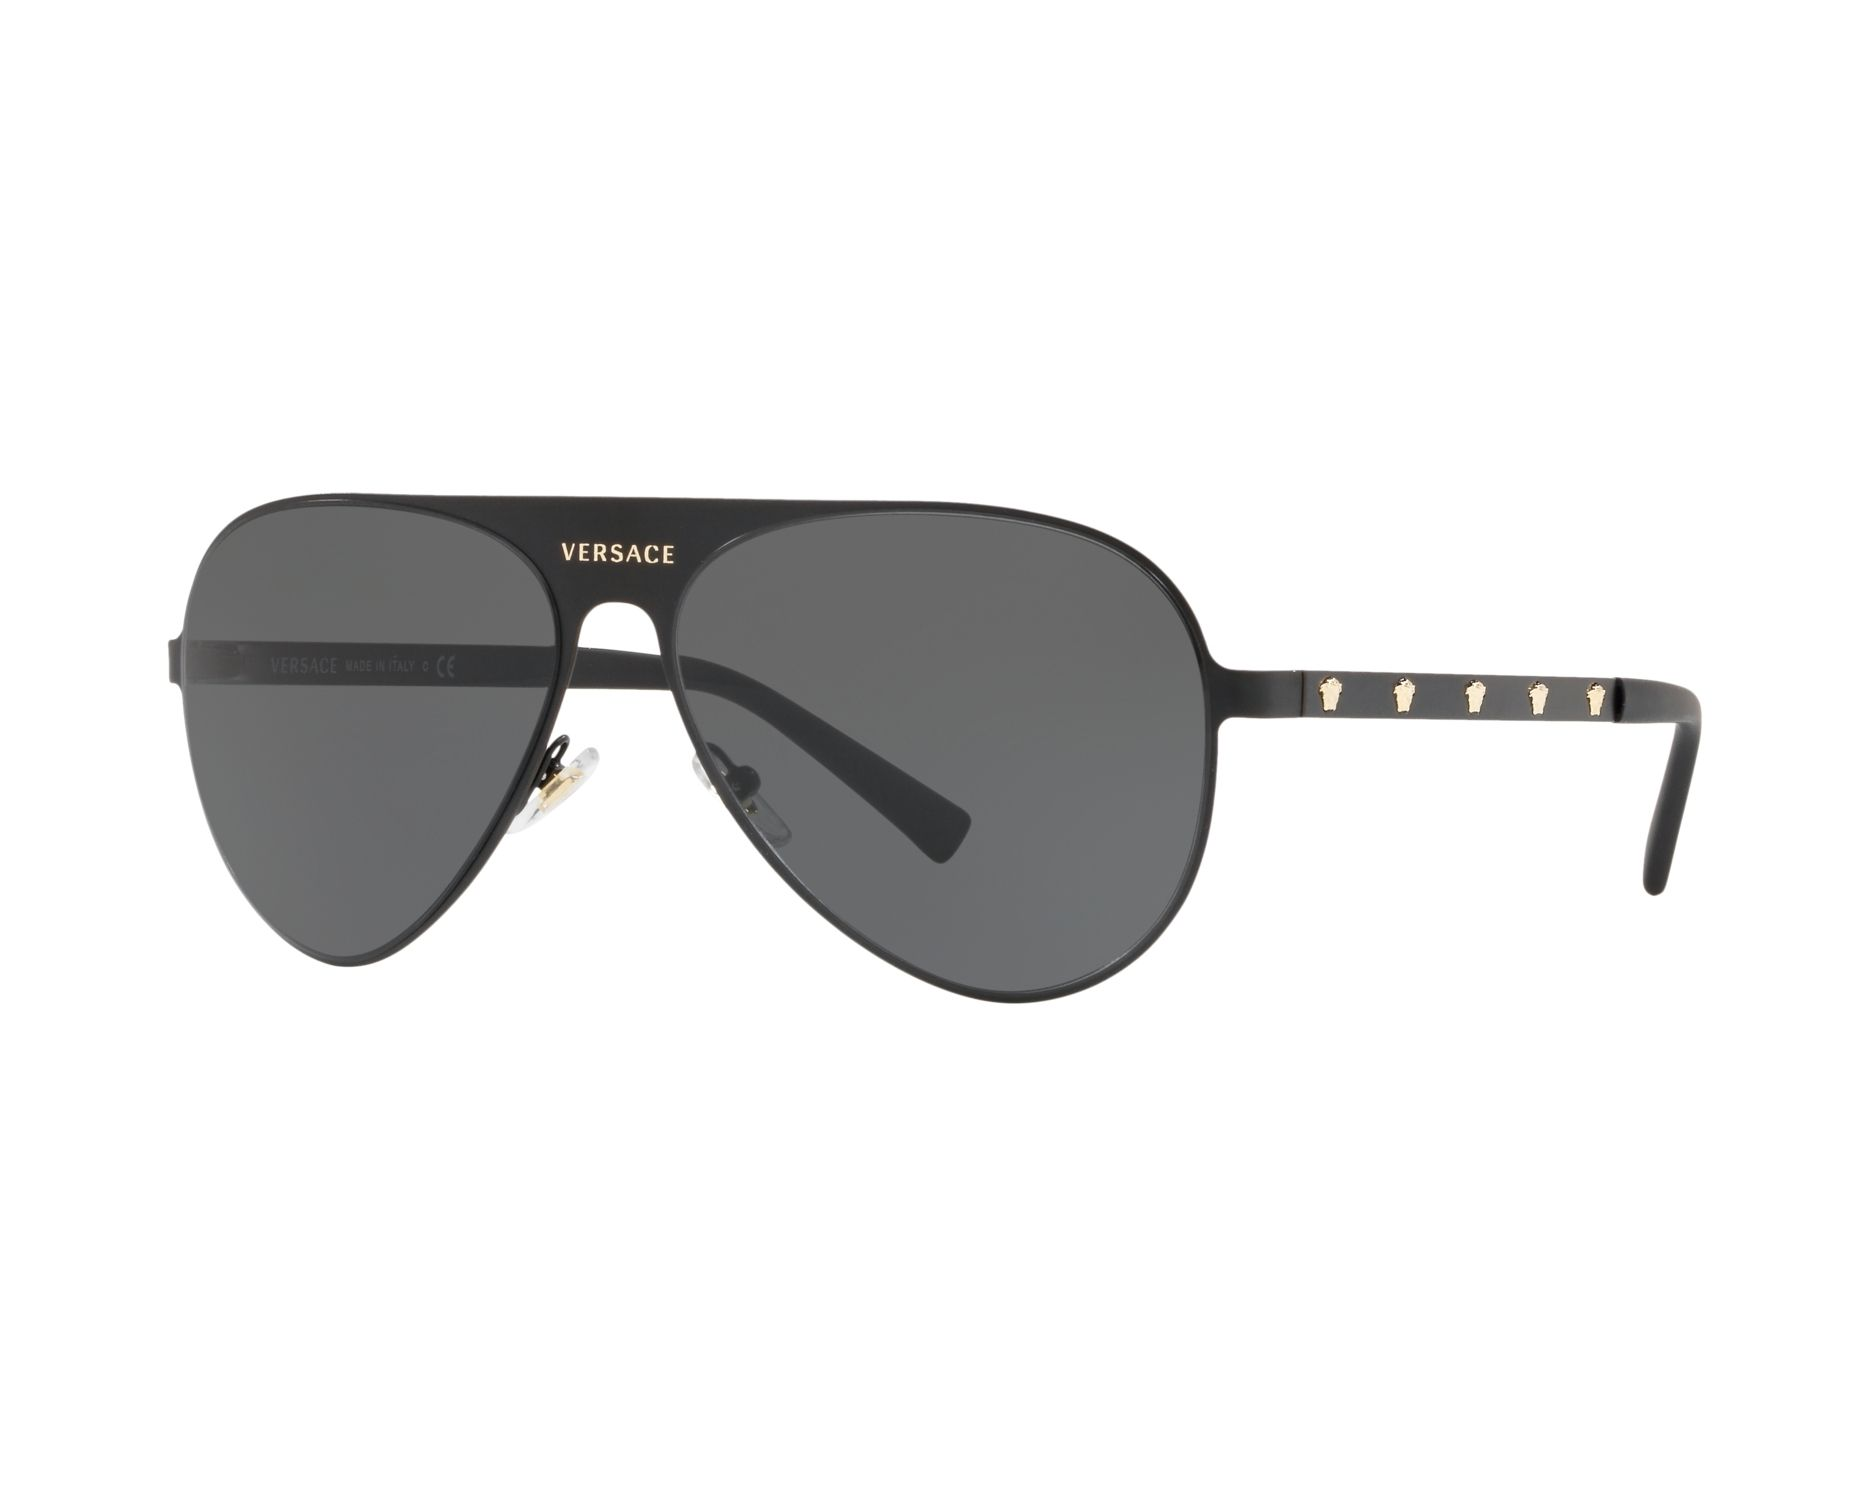 3b7fe420ee6 Sunglasses Versace VE-2189 142587 59-14 Black Gold